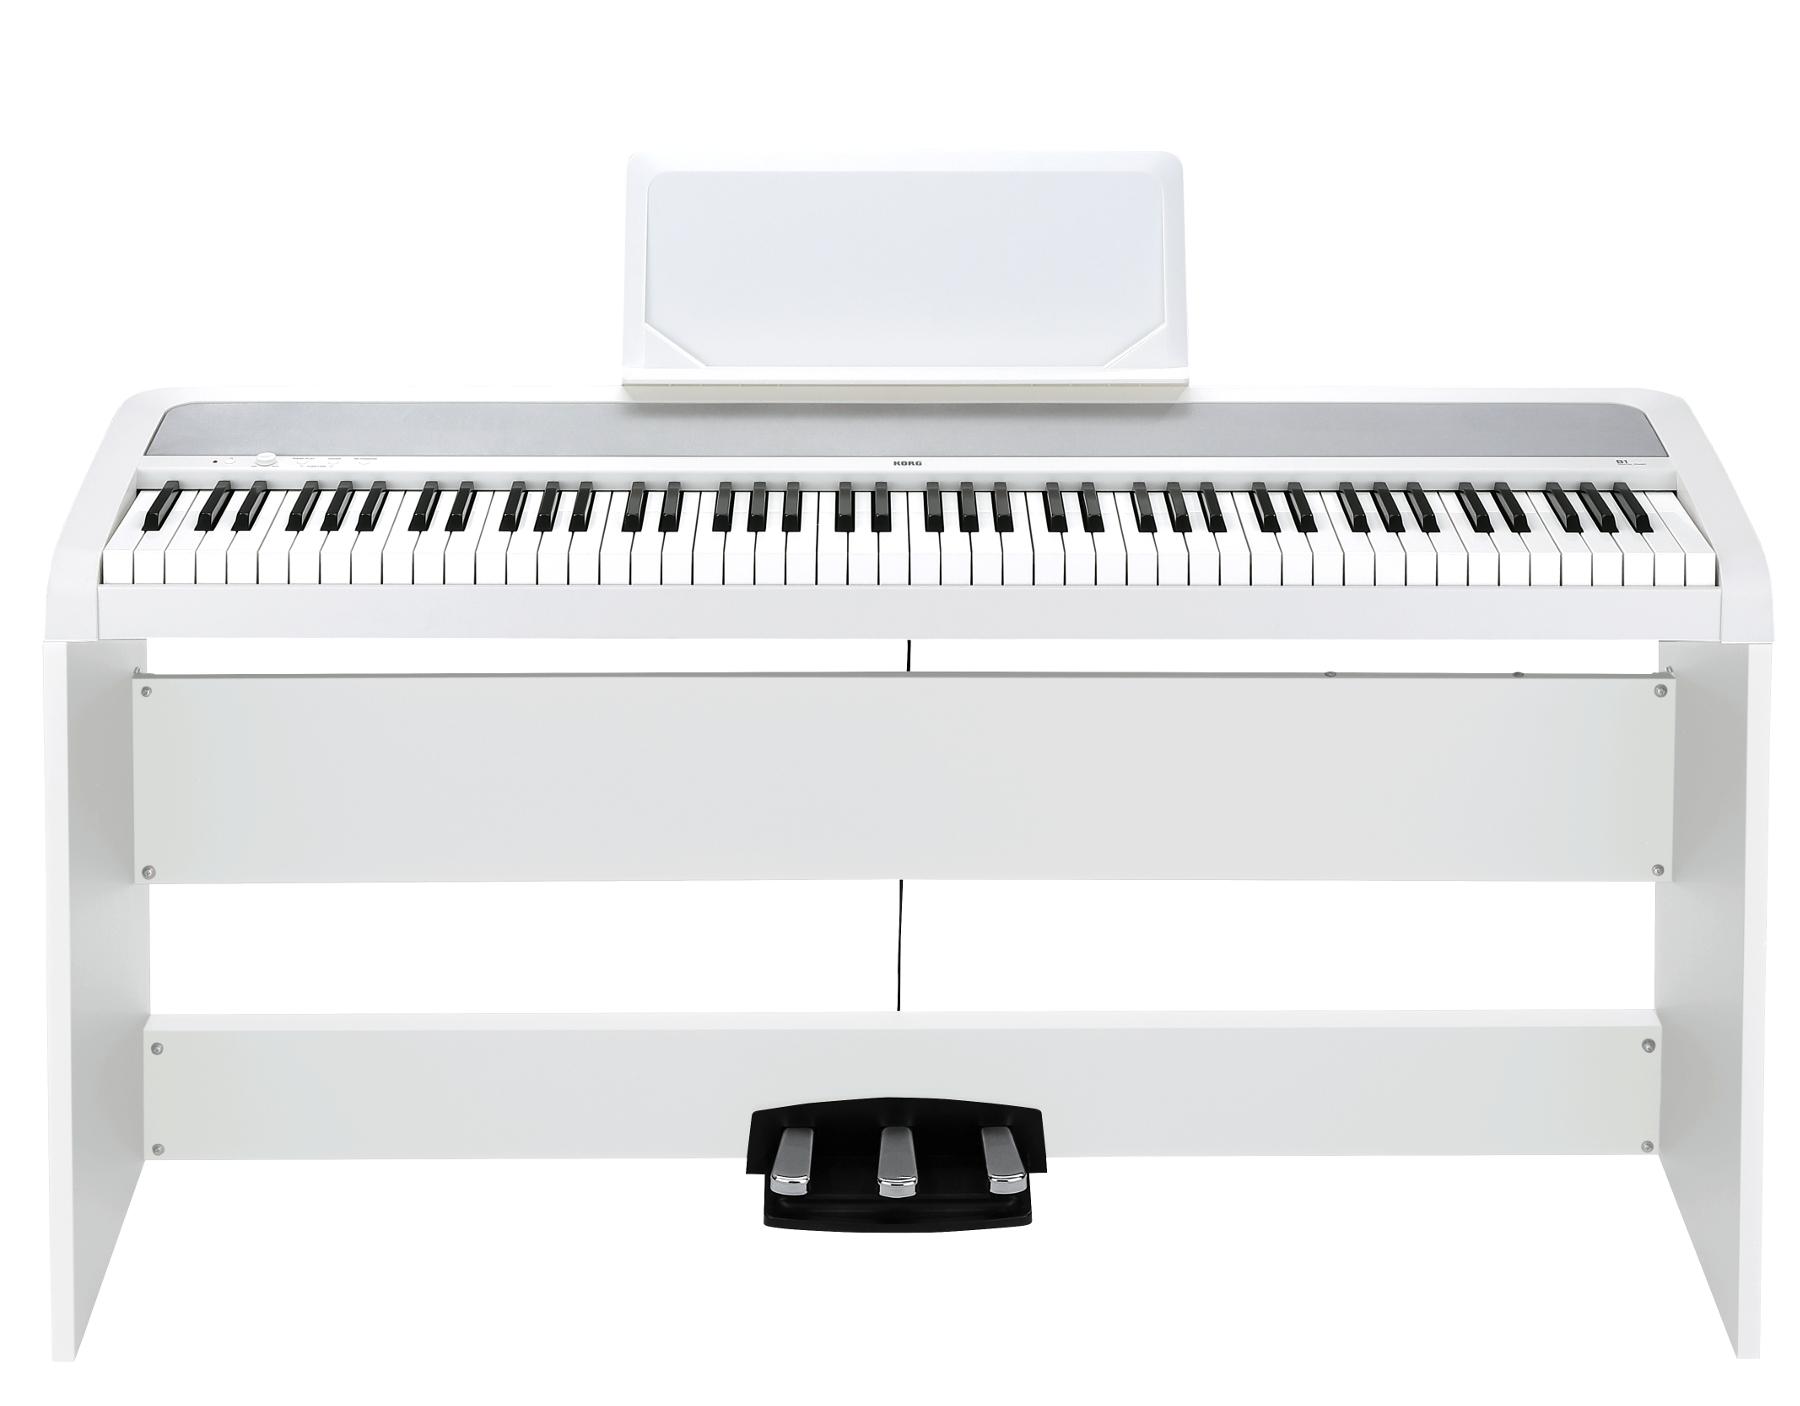 B1SP 88-Key Digital Piano Package